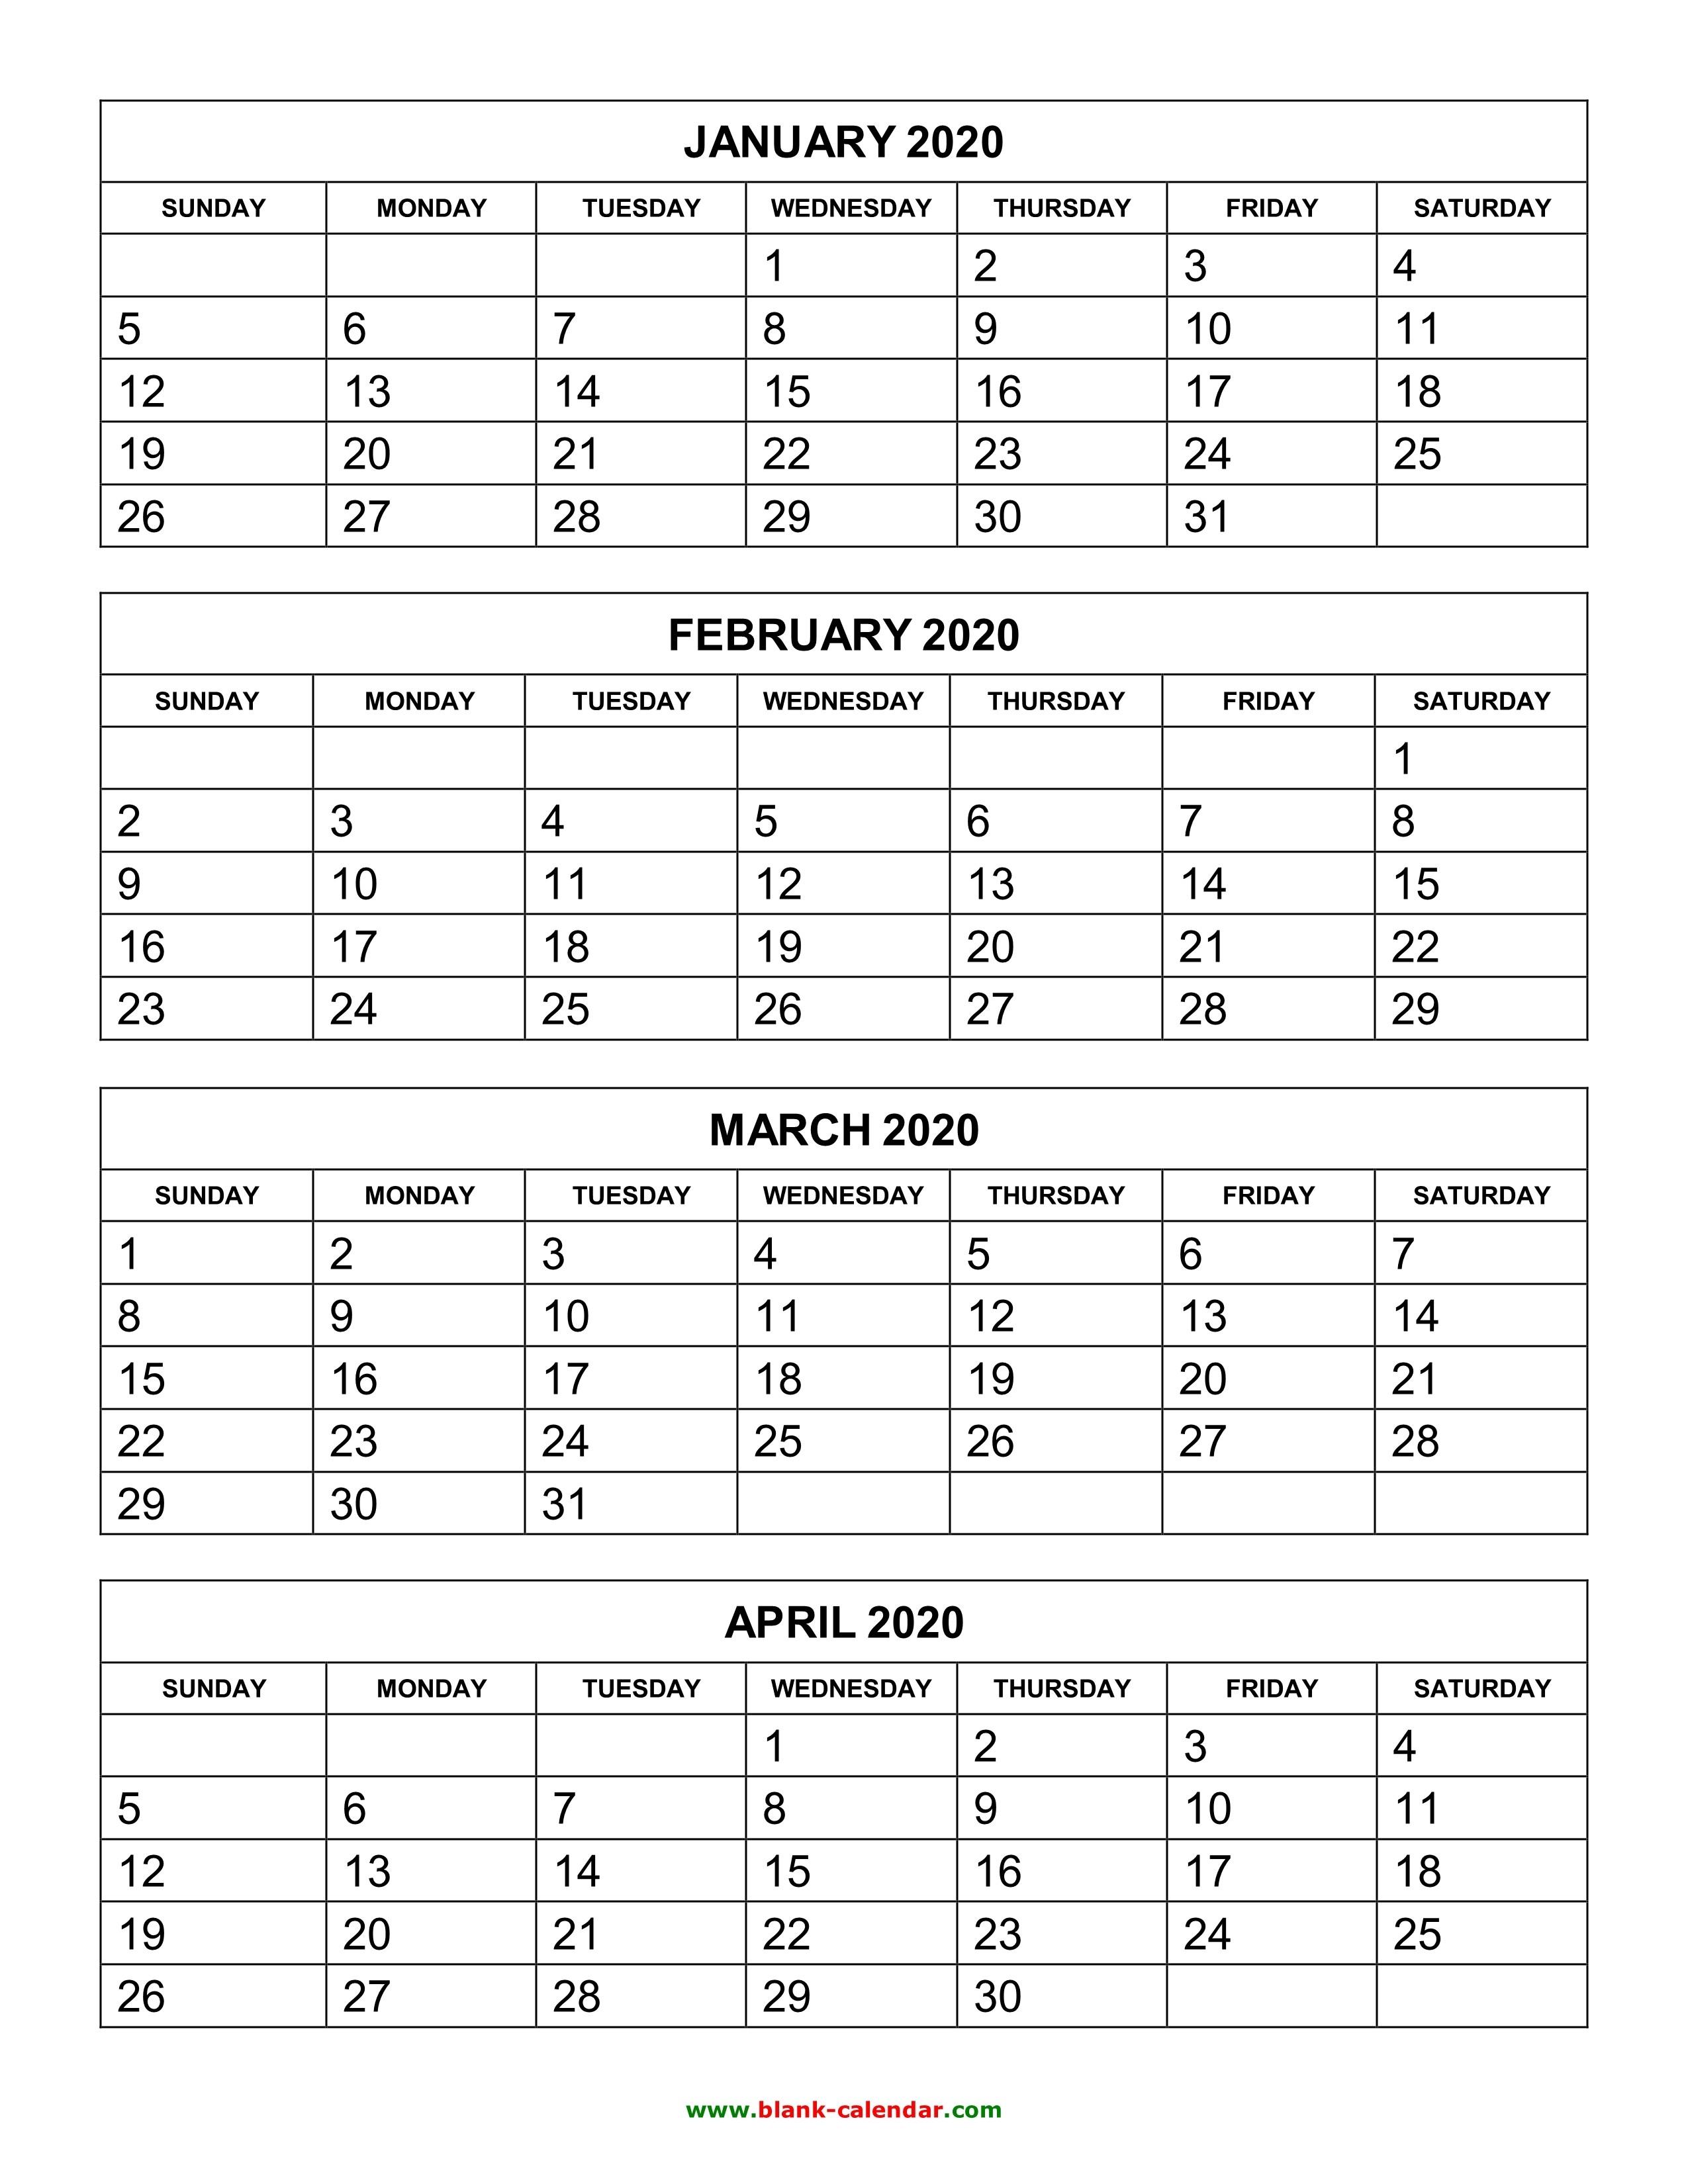 Free Download Printable Calendar 2020, 4 Months Per Page, 3-Calendar Templates 3 Months Per Page 2020